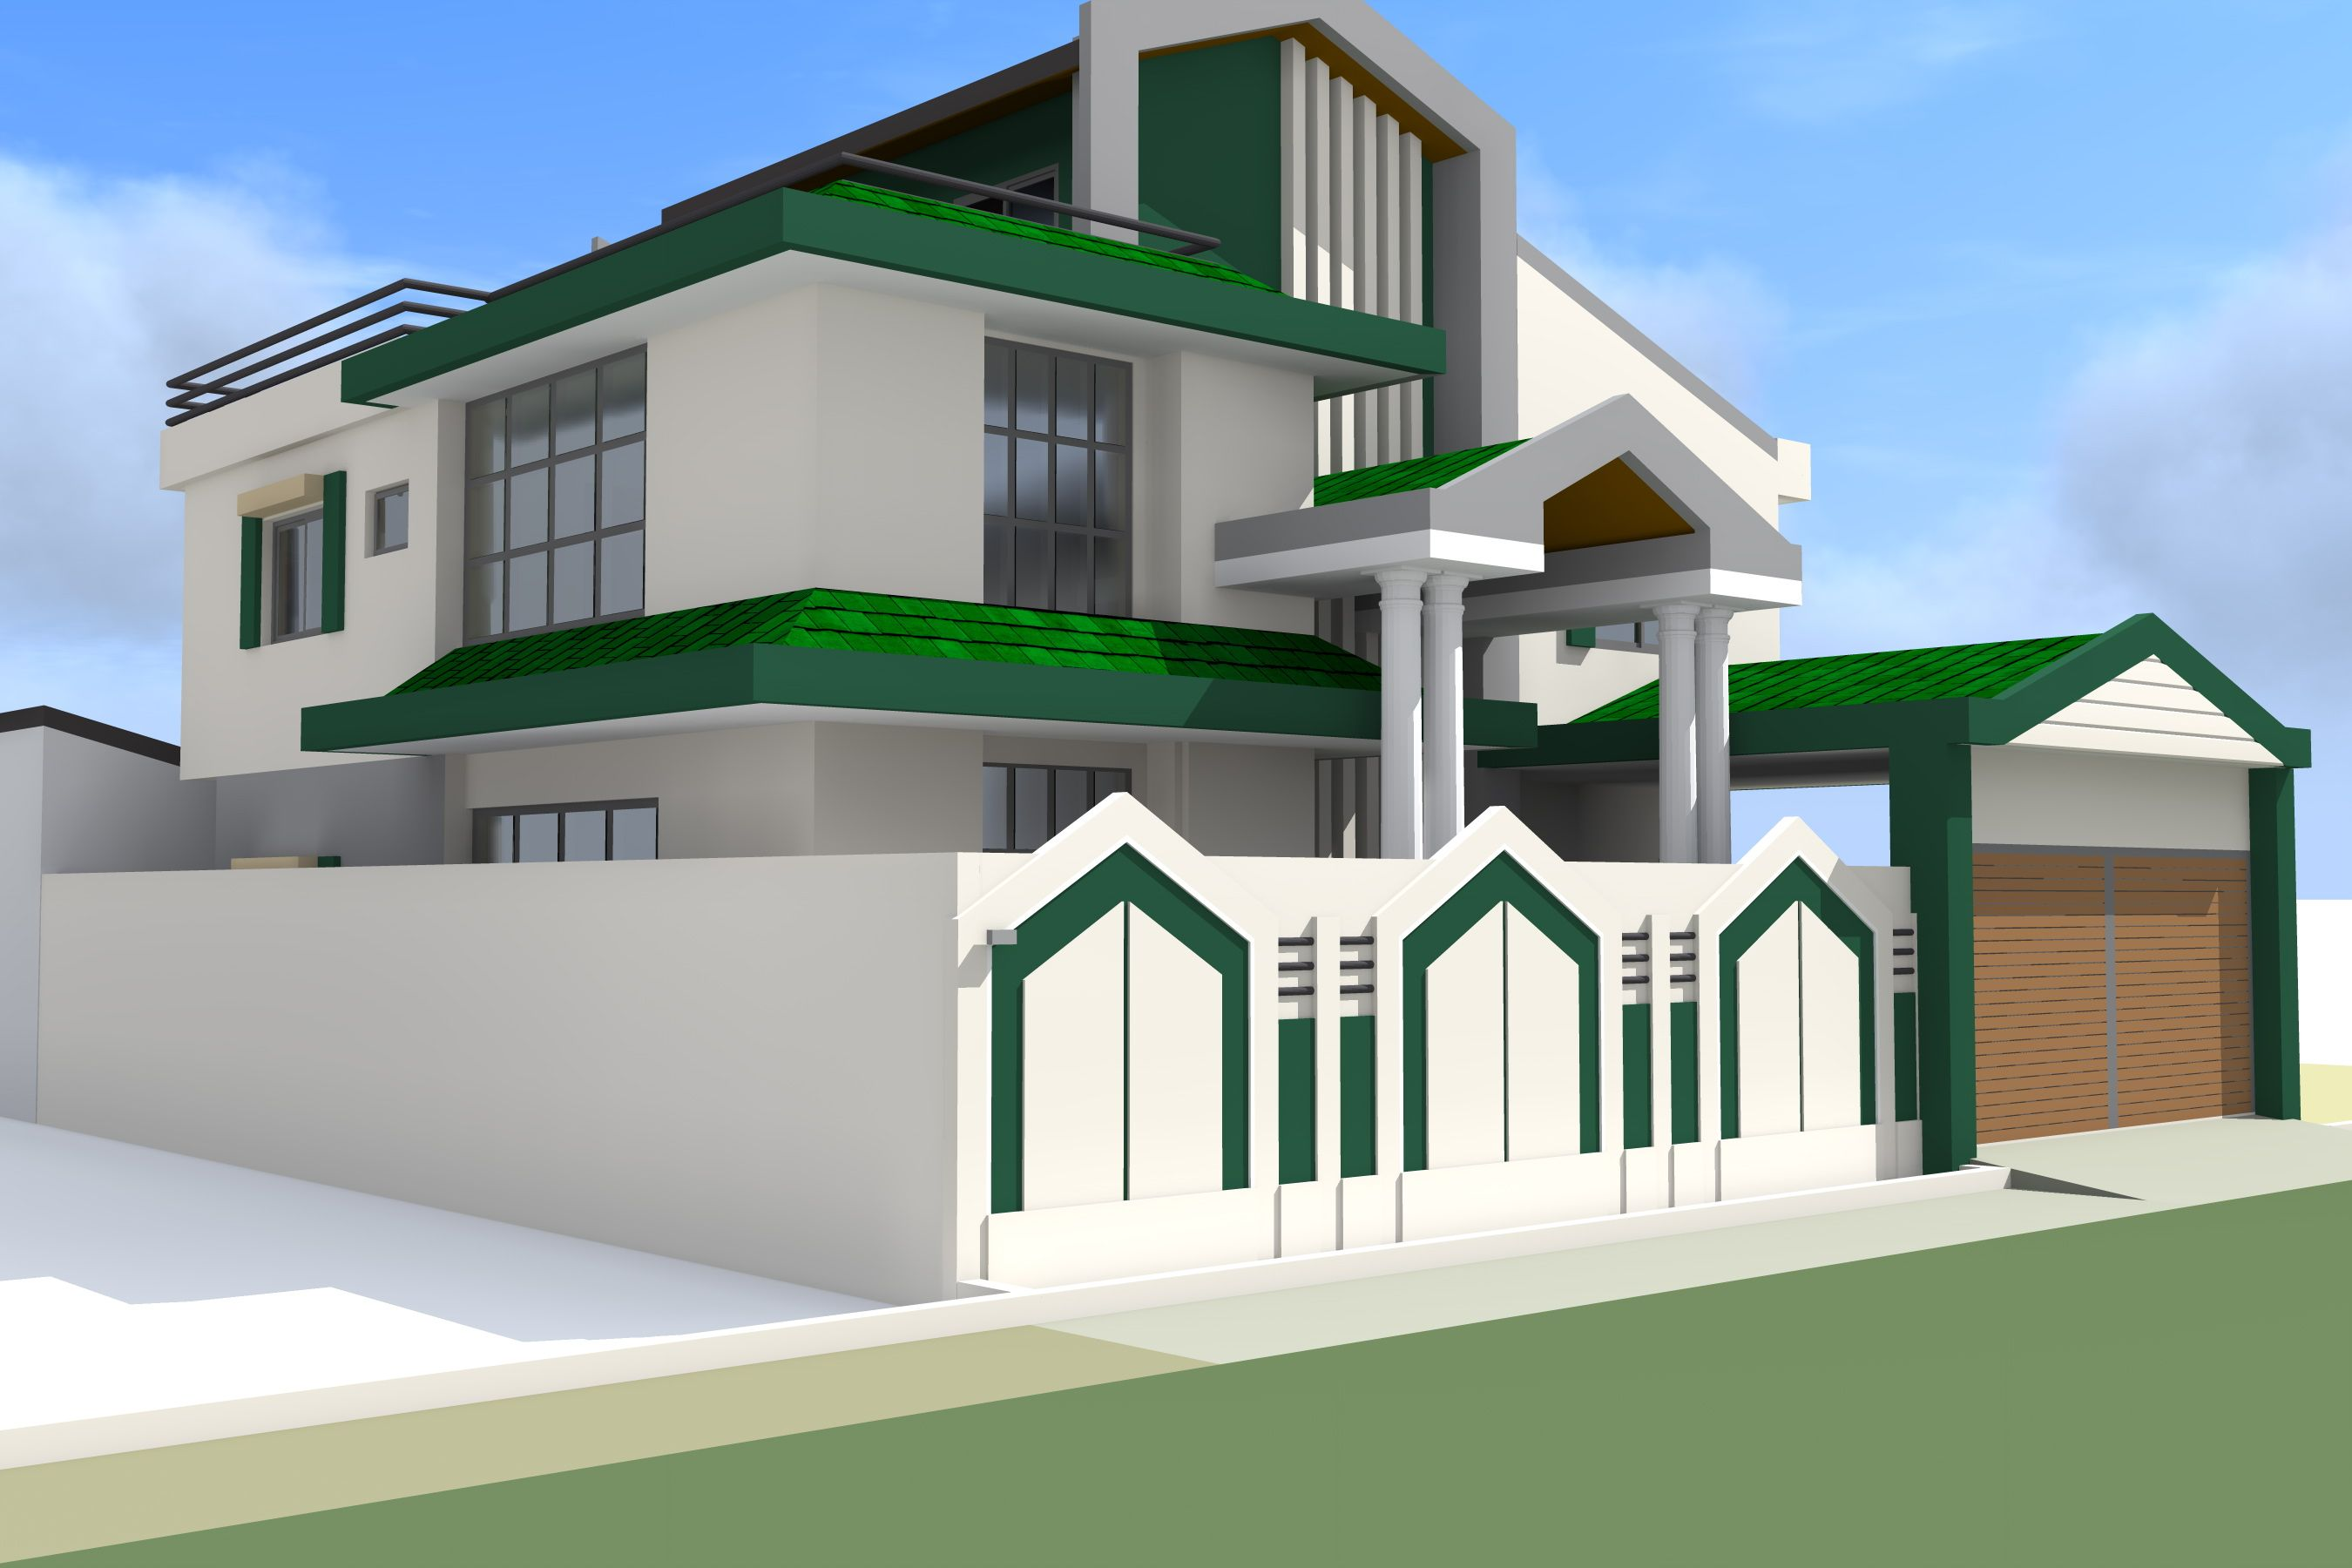 projet de construction d 39 une villa a conakry en guinee. Black Bedroom Furniture Sets. Home Design Ideas